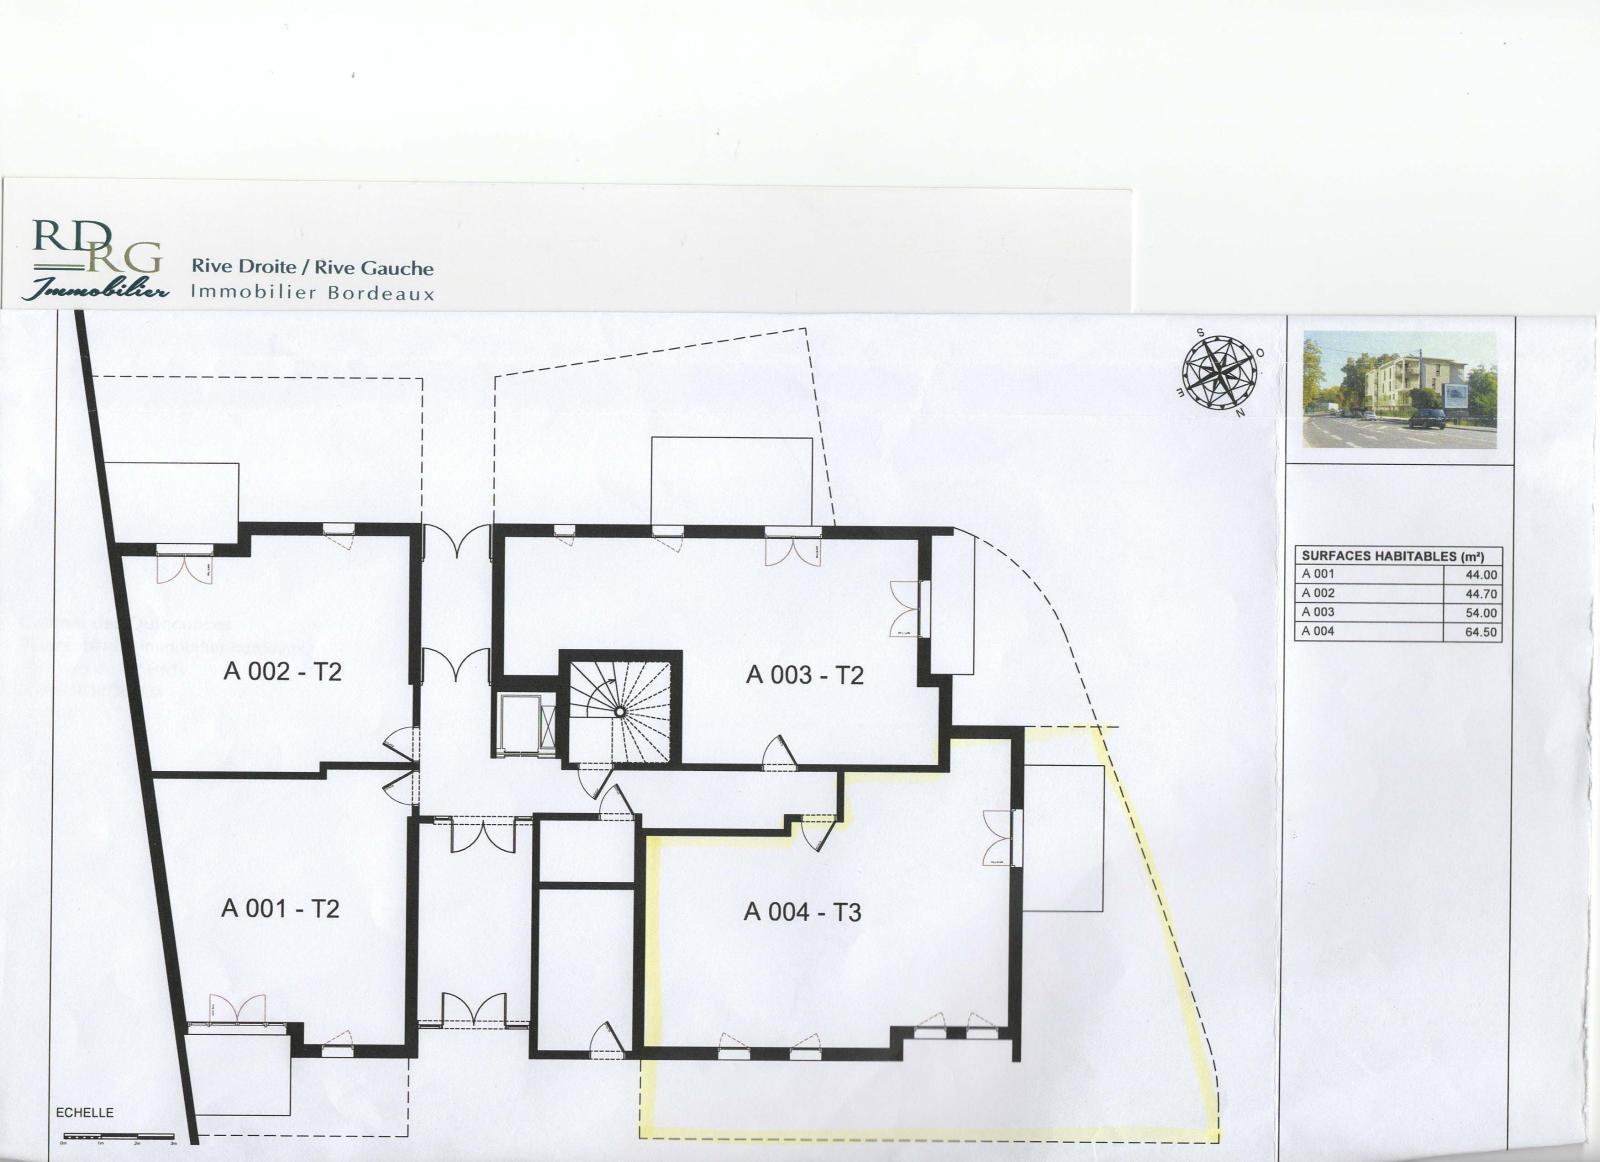 RdRg Immo Bordeaux- T3 terrasse et jardin Caudéran Stéhélin ...